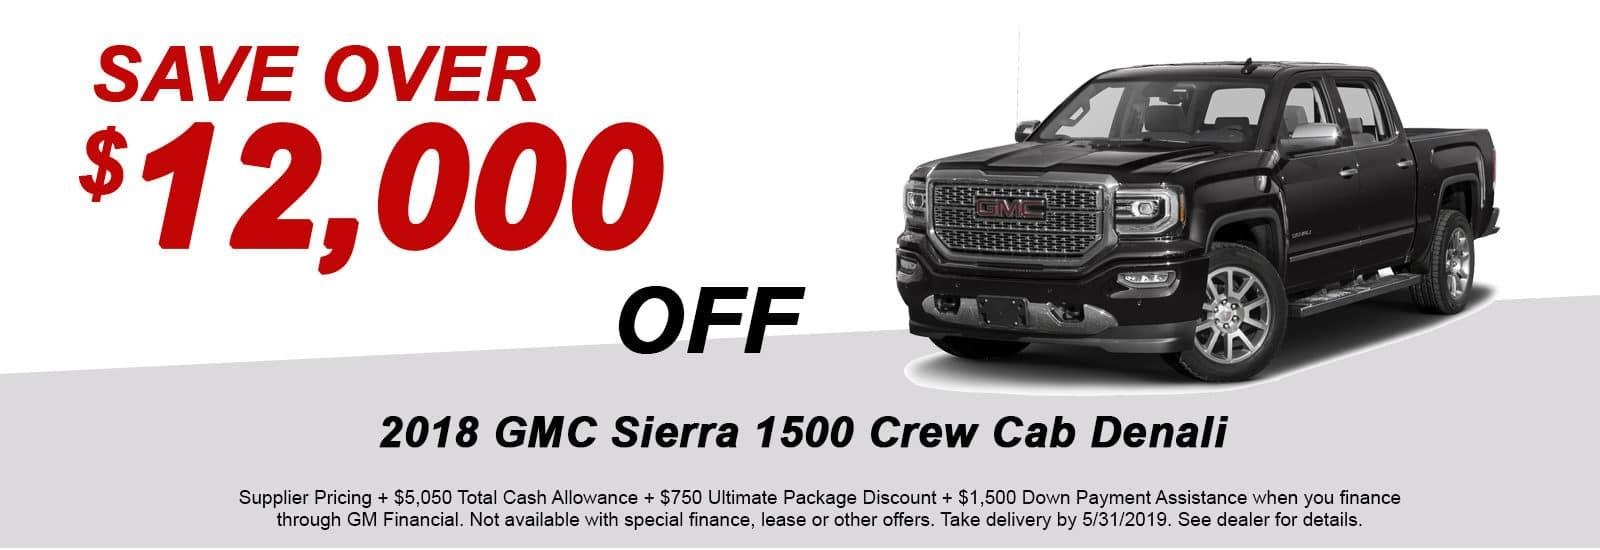 Sierra Crew Cab Denali